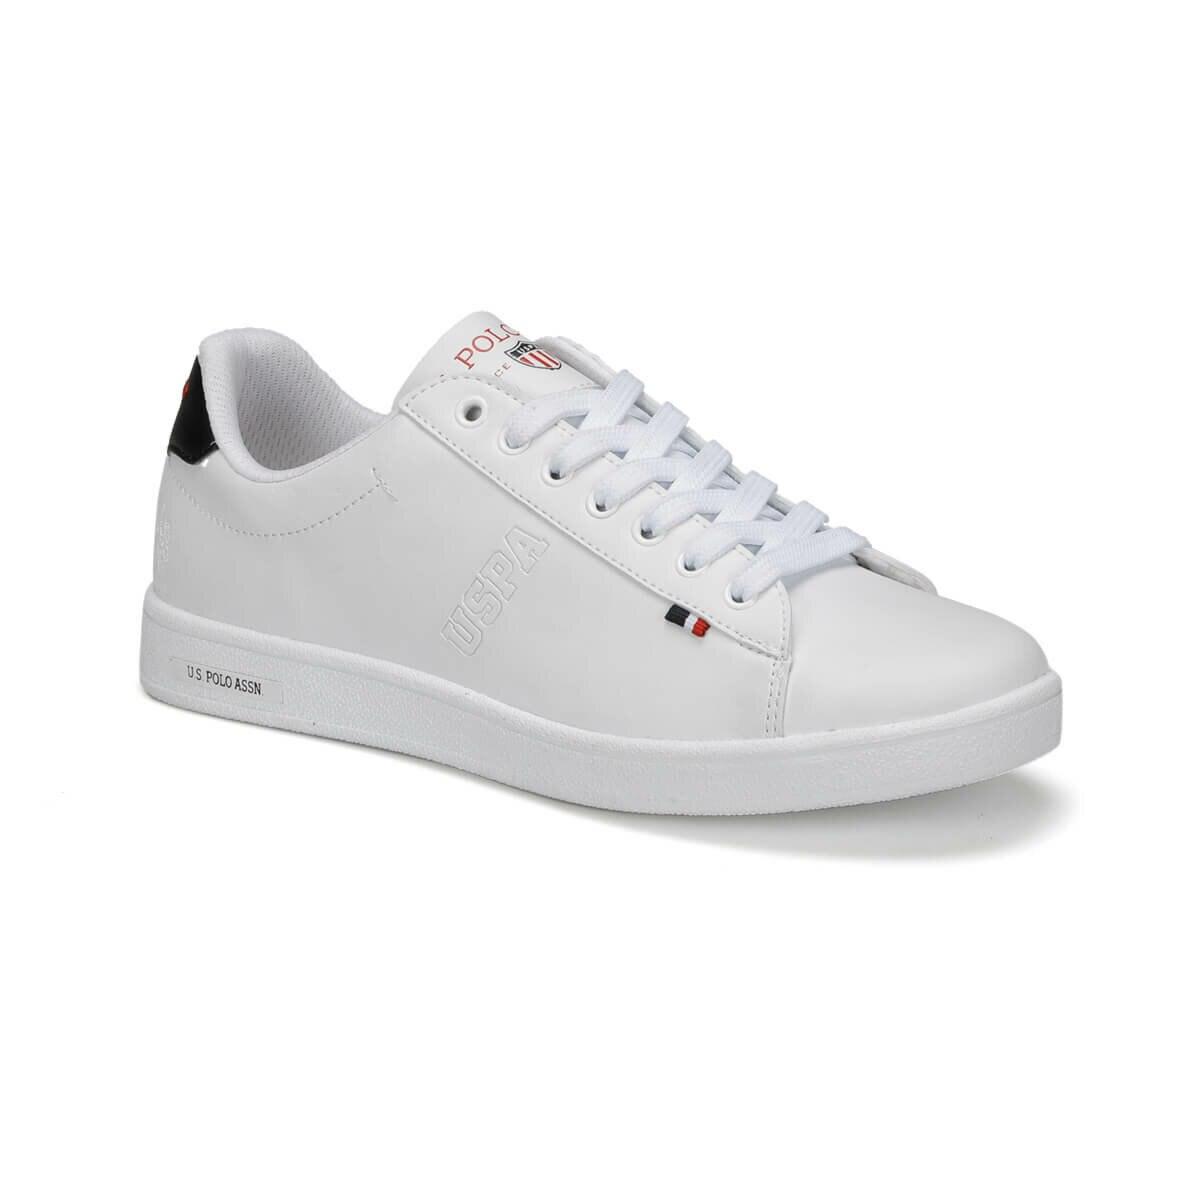 FLO FRANCO 9PR Navy Blue Women 'S Sneaker Shoes U.S. POLO ASSN.